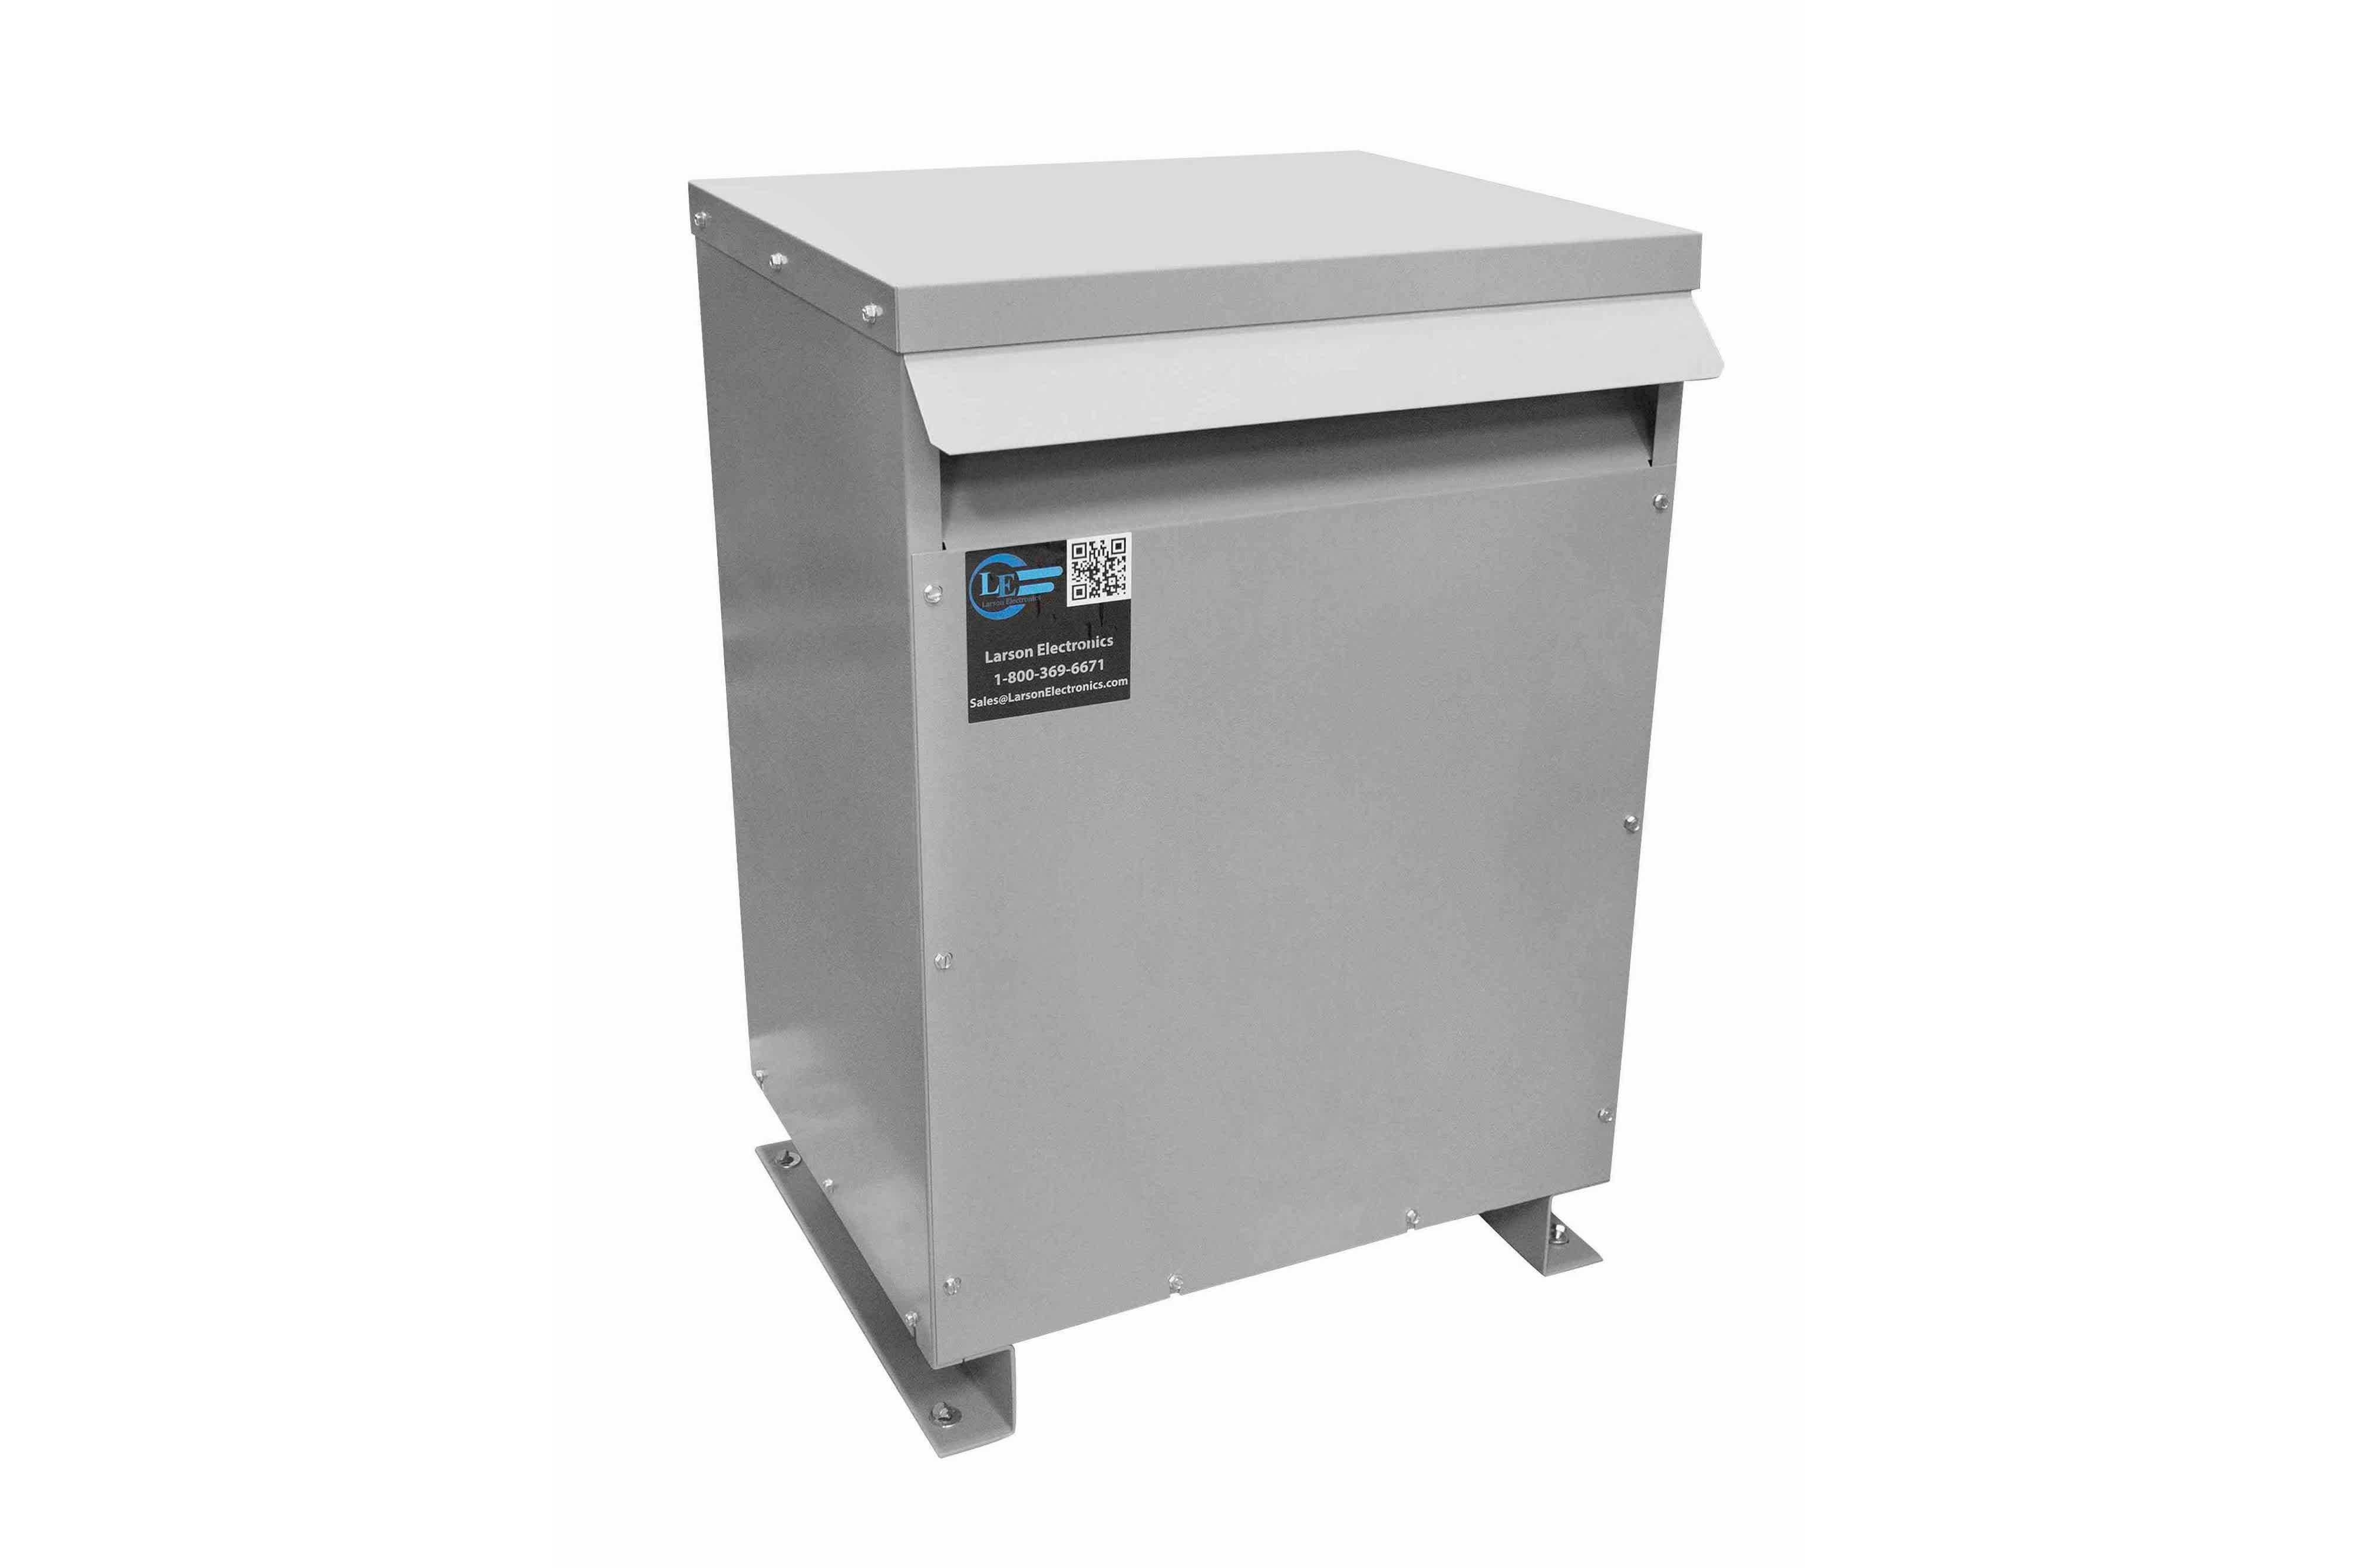 55 kVA 3PH Isolation Transformer, 220V Wye Primary, 208V Delta Secondary, N3R, Ventilated, 60 Hz